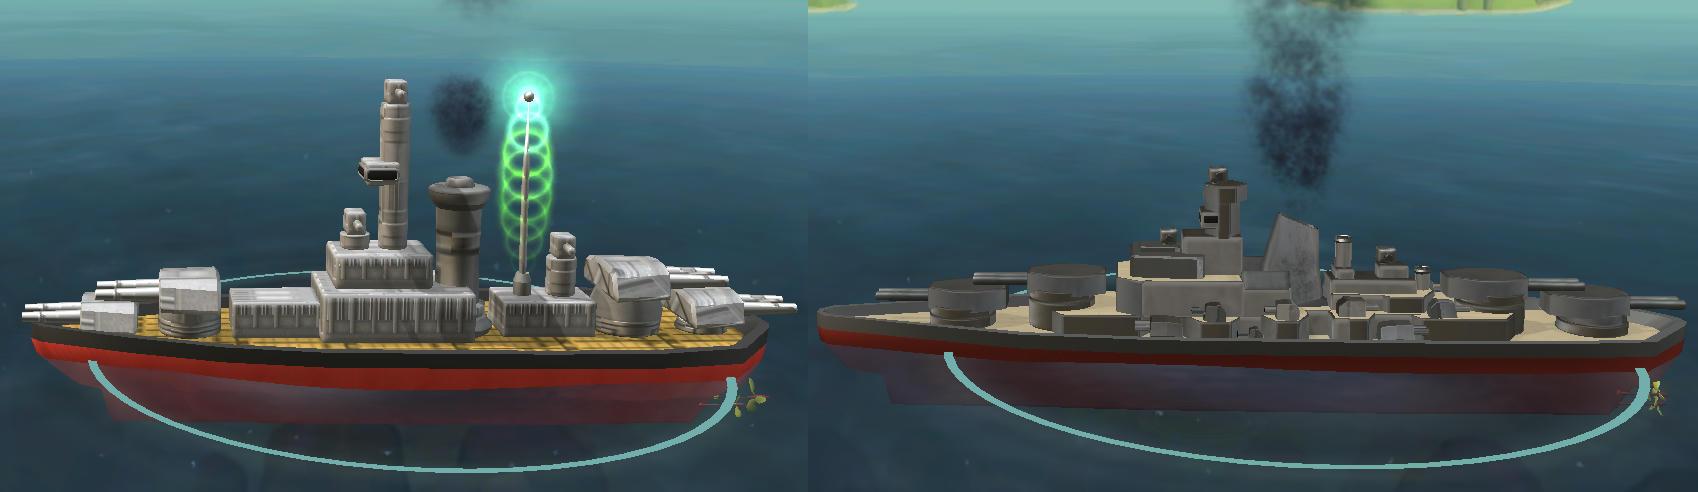 Acorazado Bismarck. 0gi7gkfzvtrkphnzg